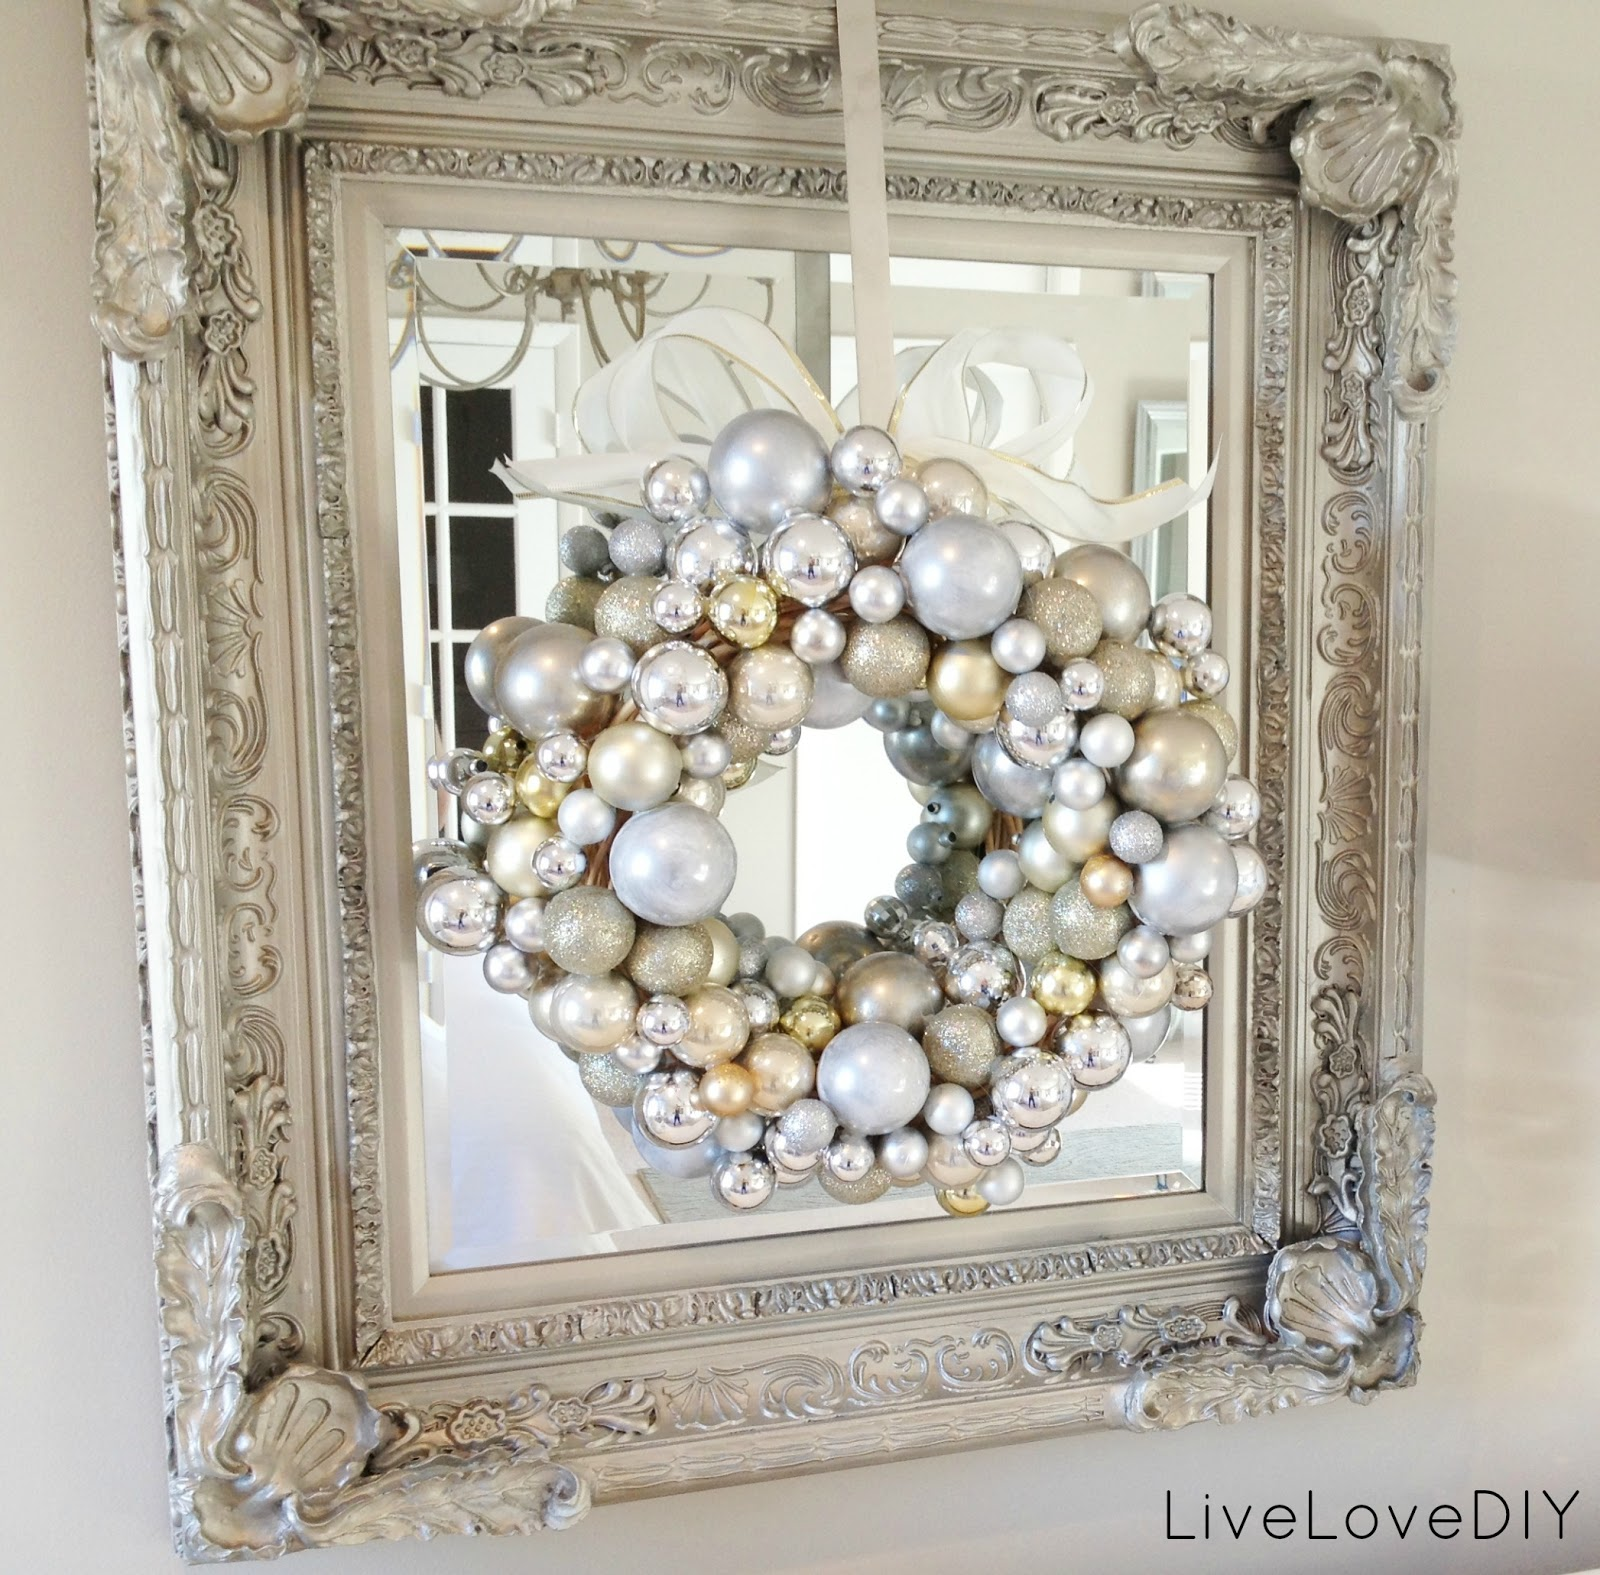 Mirror Decorating Ideas | Fotolip.com Rich image and wallpaper